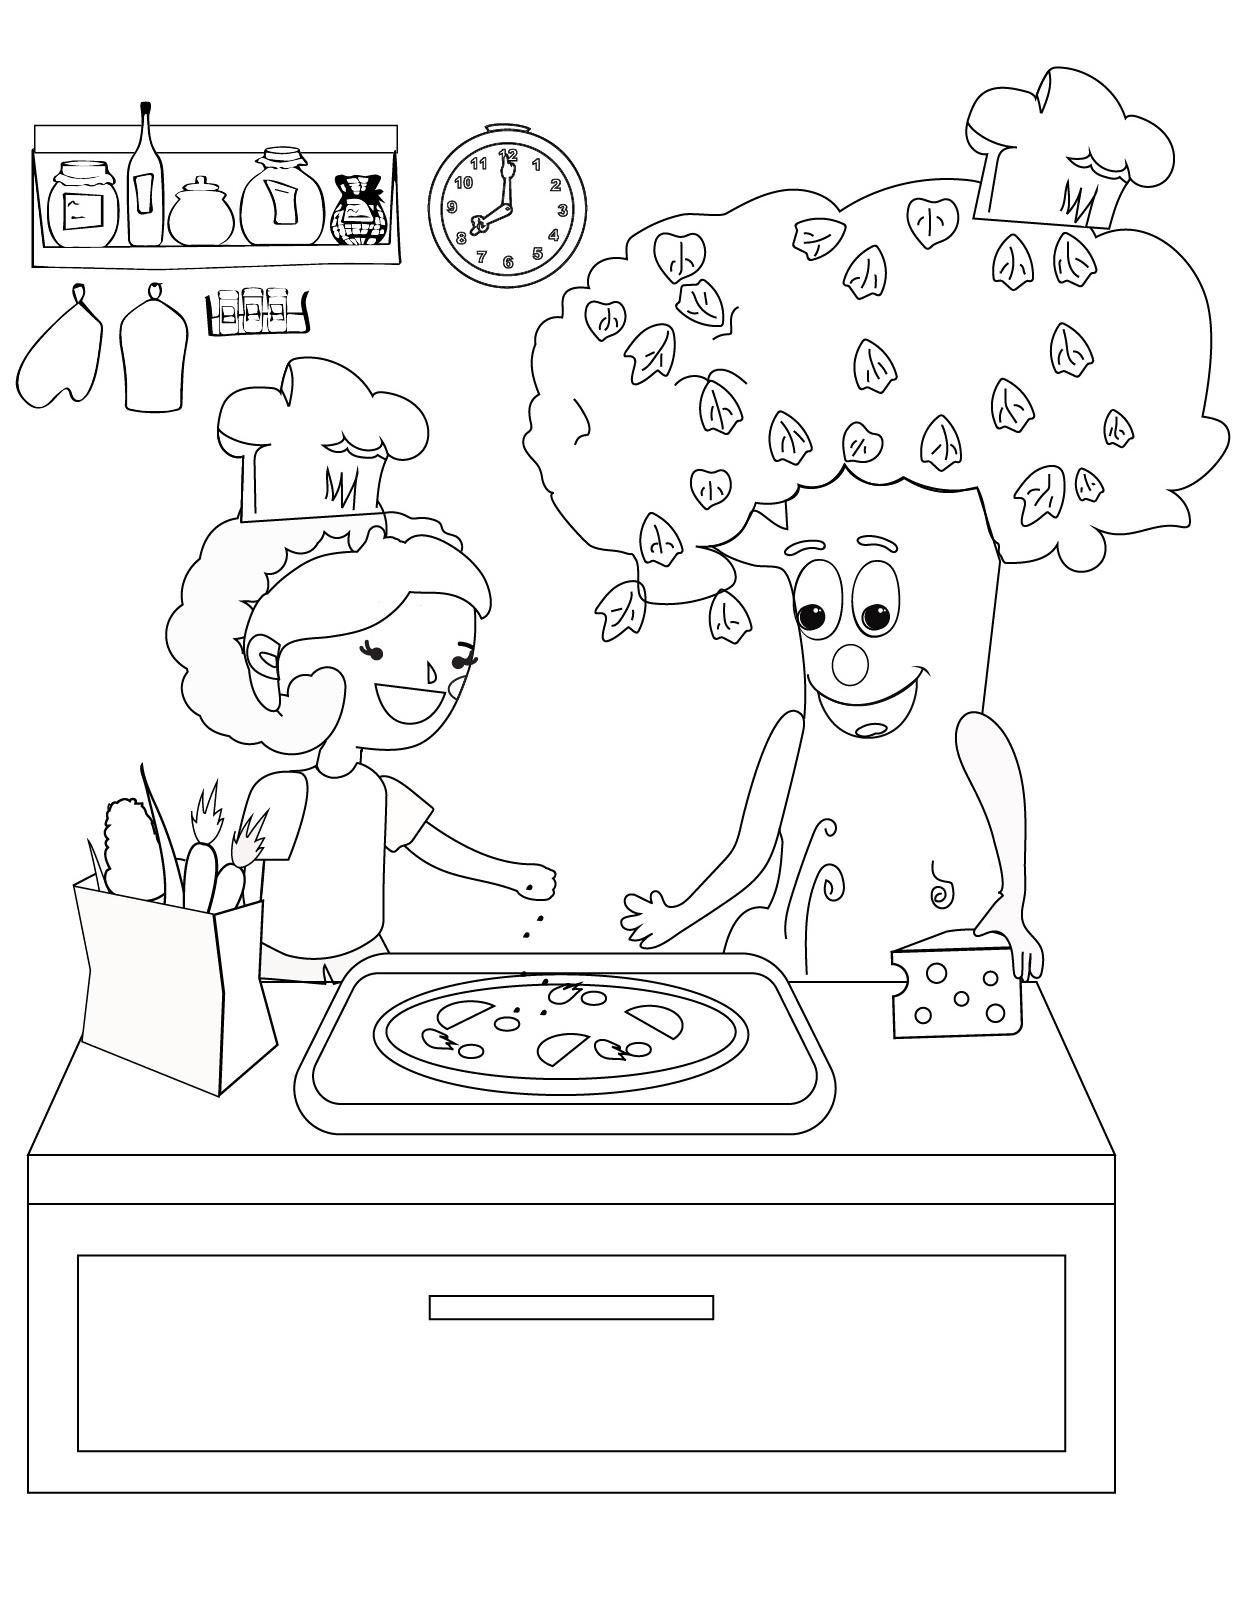 catalpin cocinando2